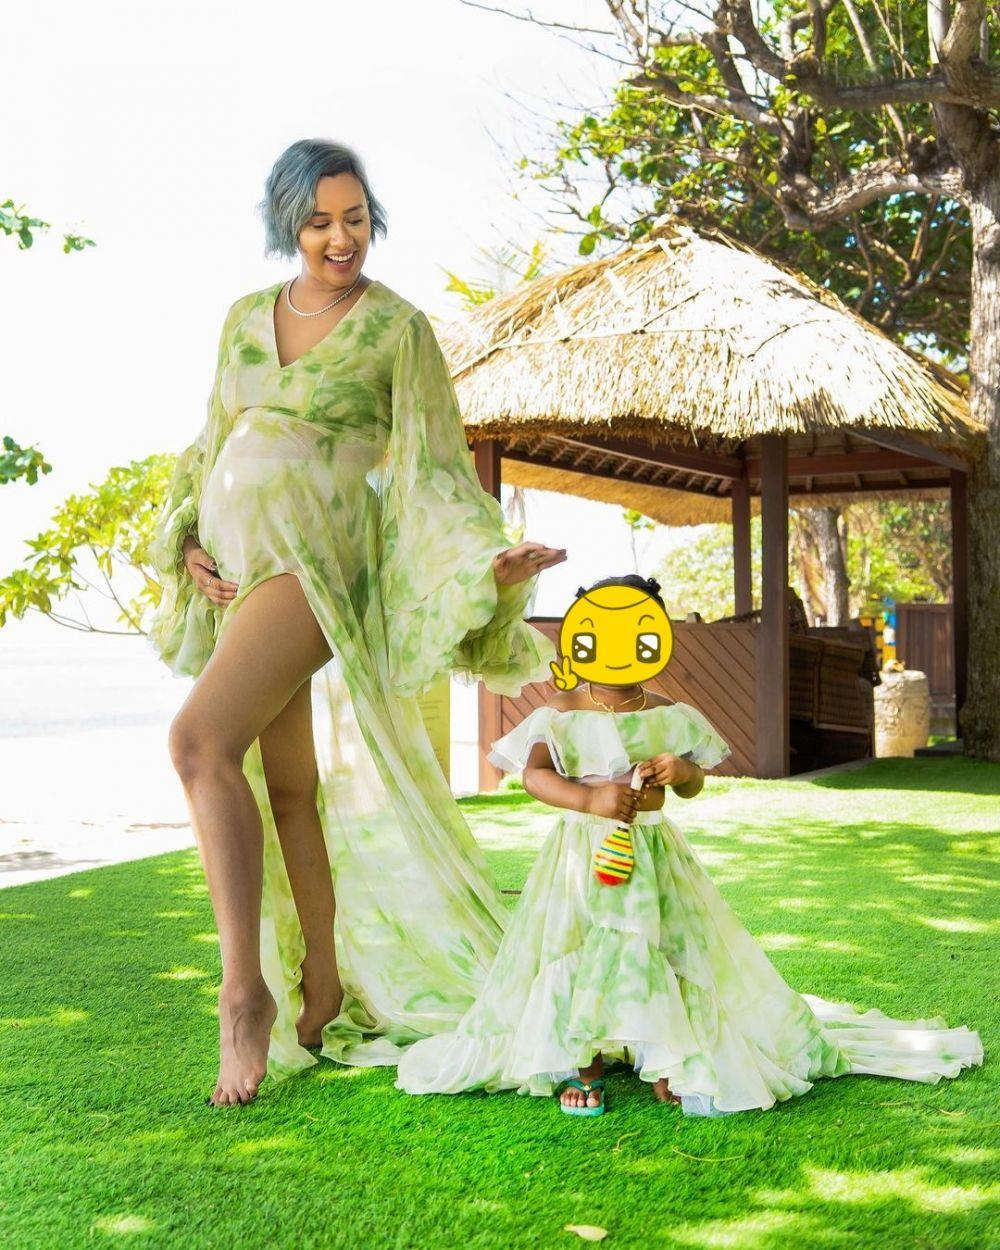 Kimmy Jayanti maternity © 2020 brilio.net